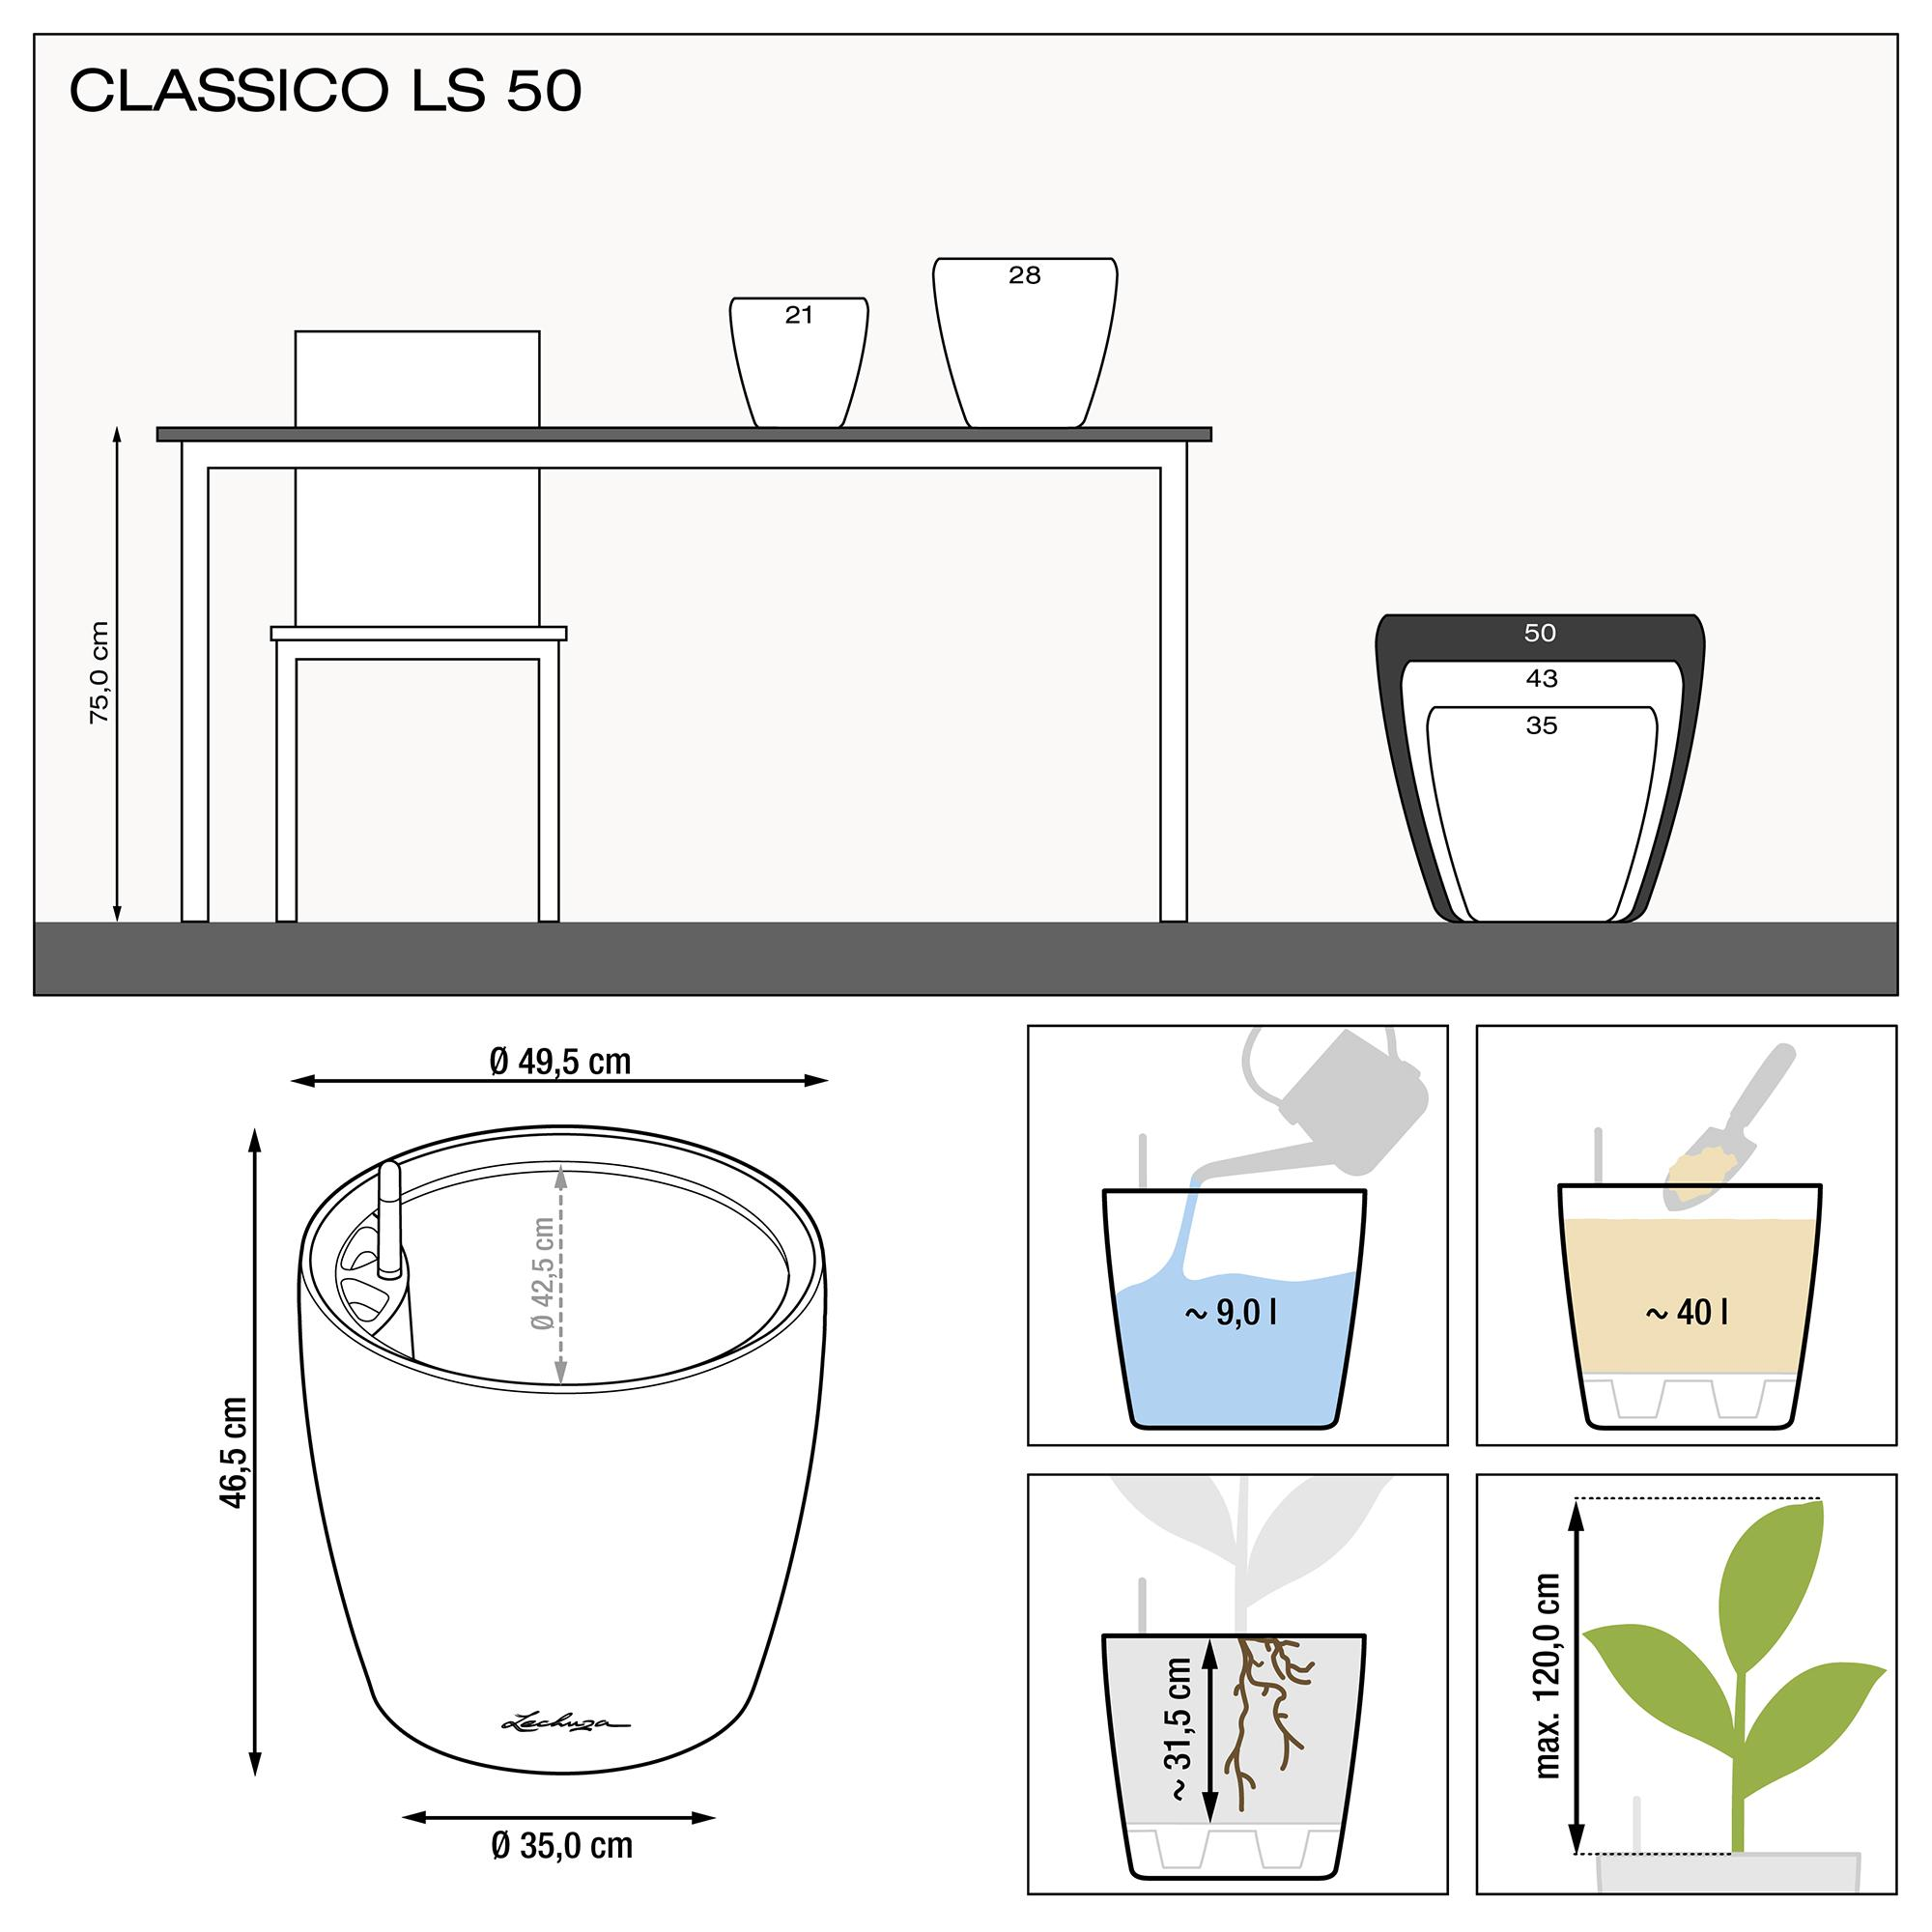 CLASSICO LS 50 expreso metalizado - Imagen 3